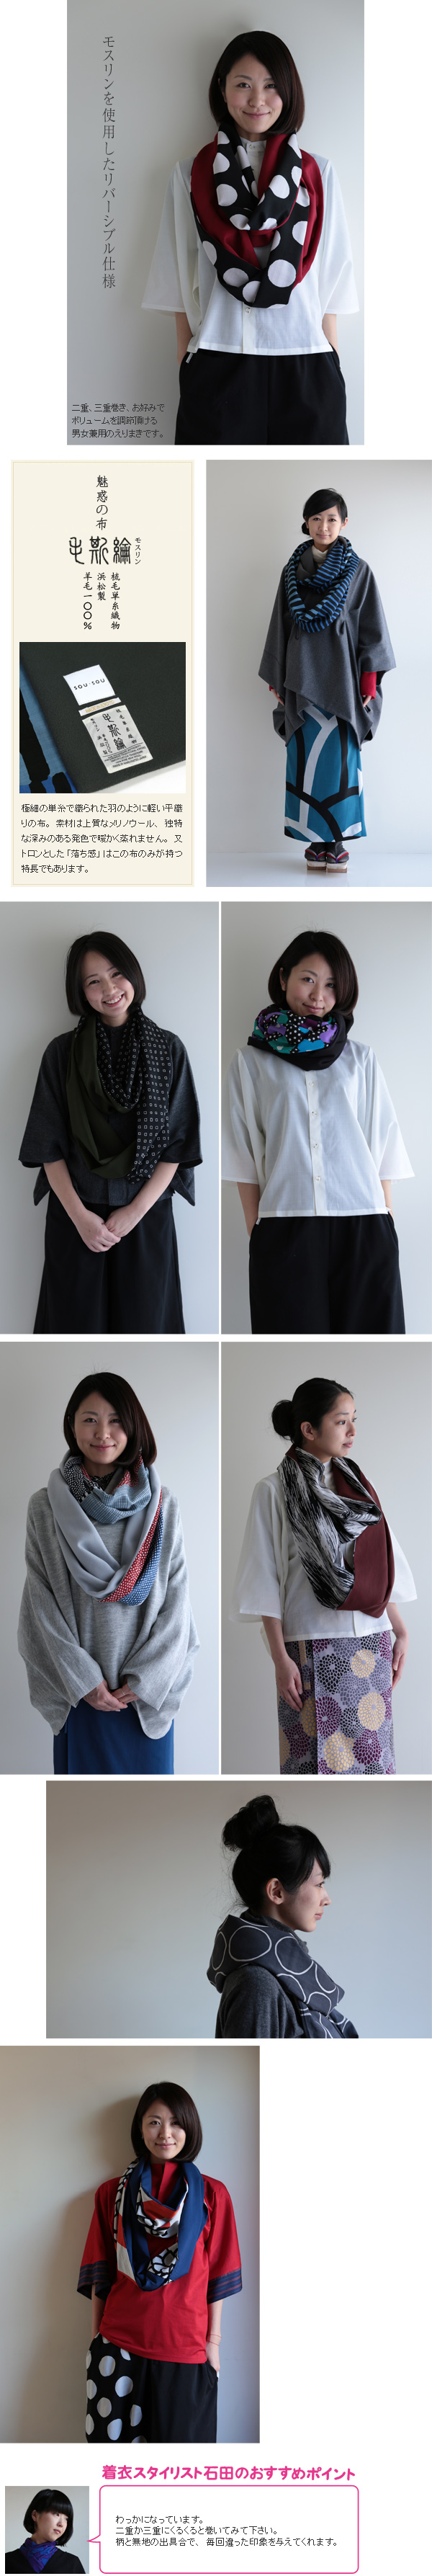 SOU・SOU着衣 えりまき(モスリン) - モスリン地をたっぷり使用した、ボリューム感のあるリバーシブルえりまき